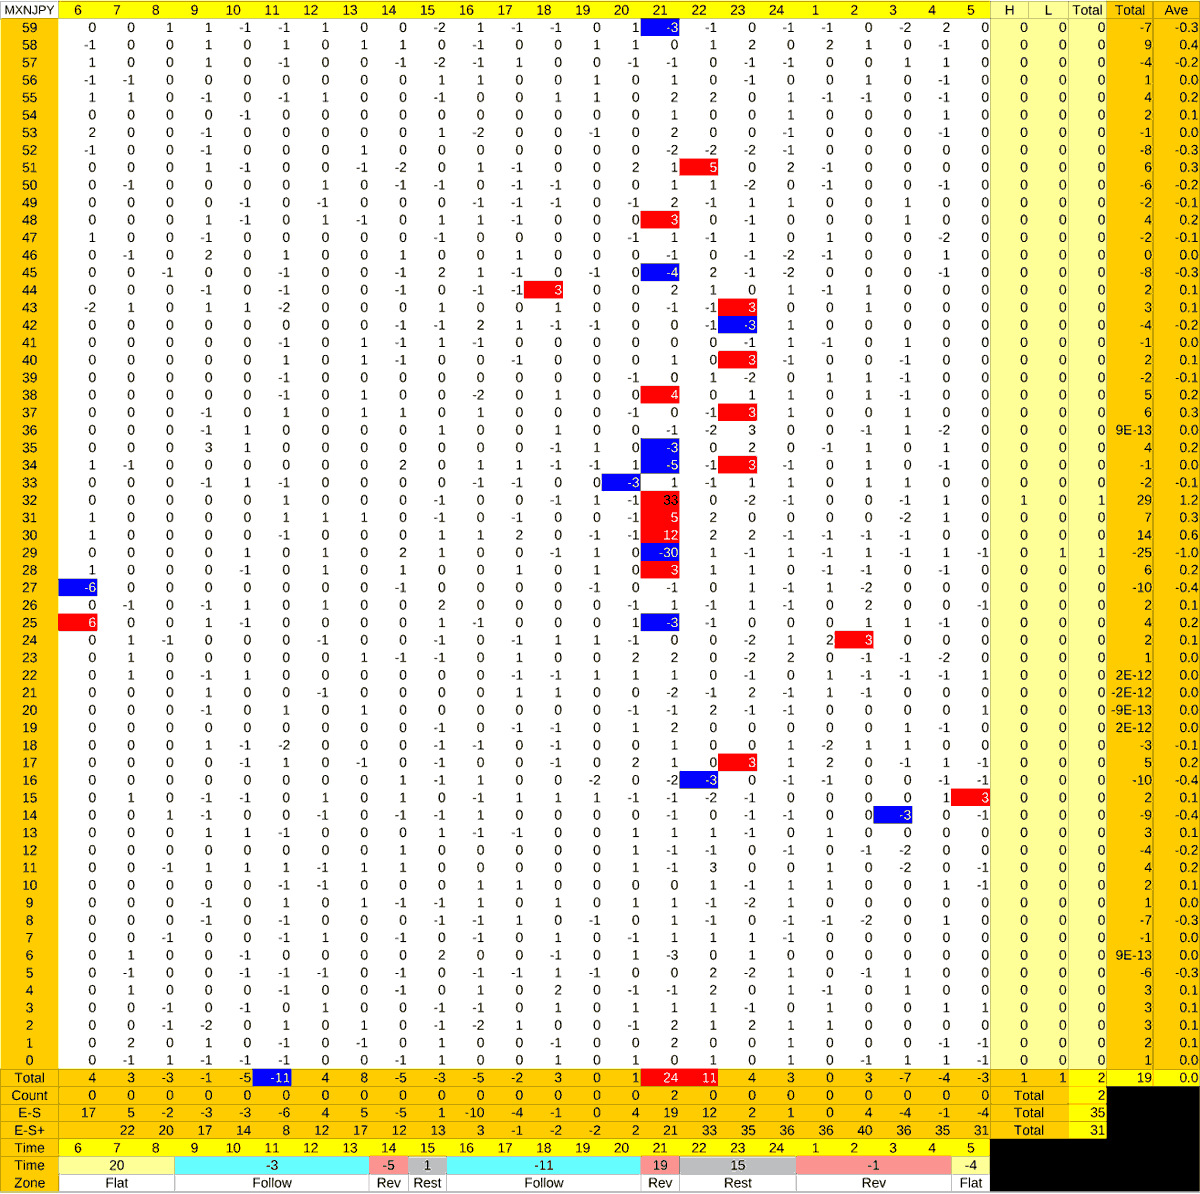 20210604_HS(3)MXNJPY-